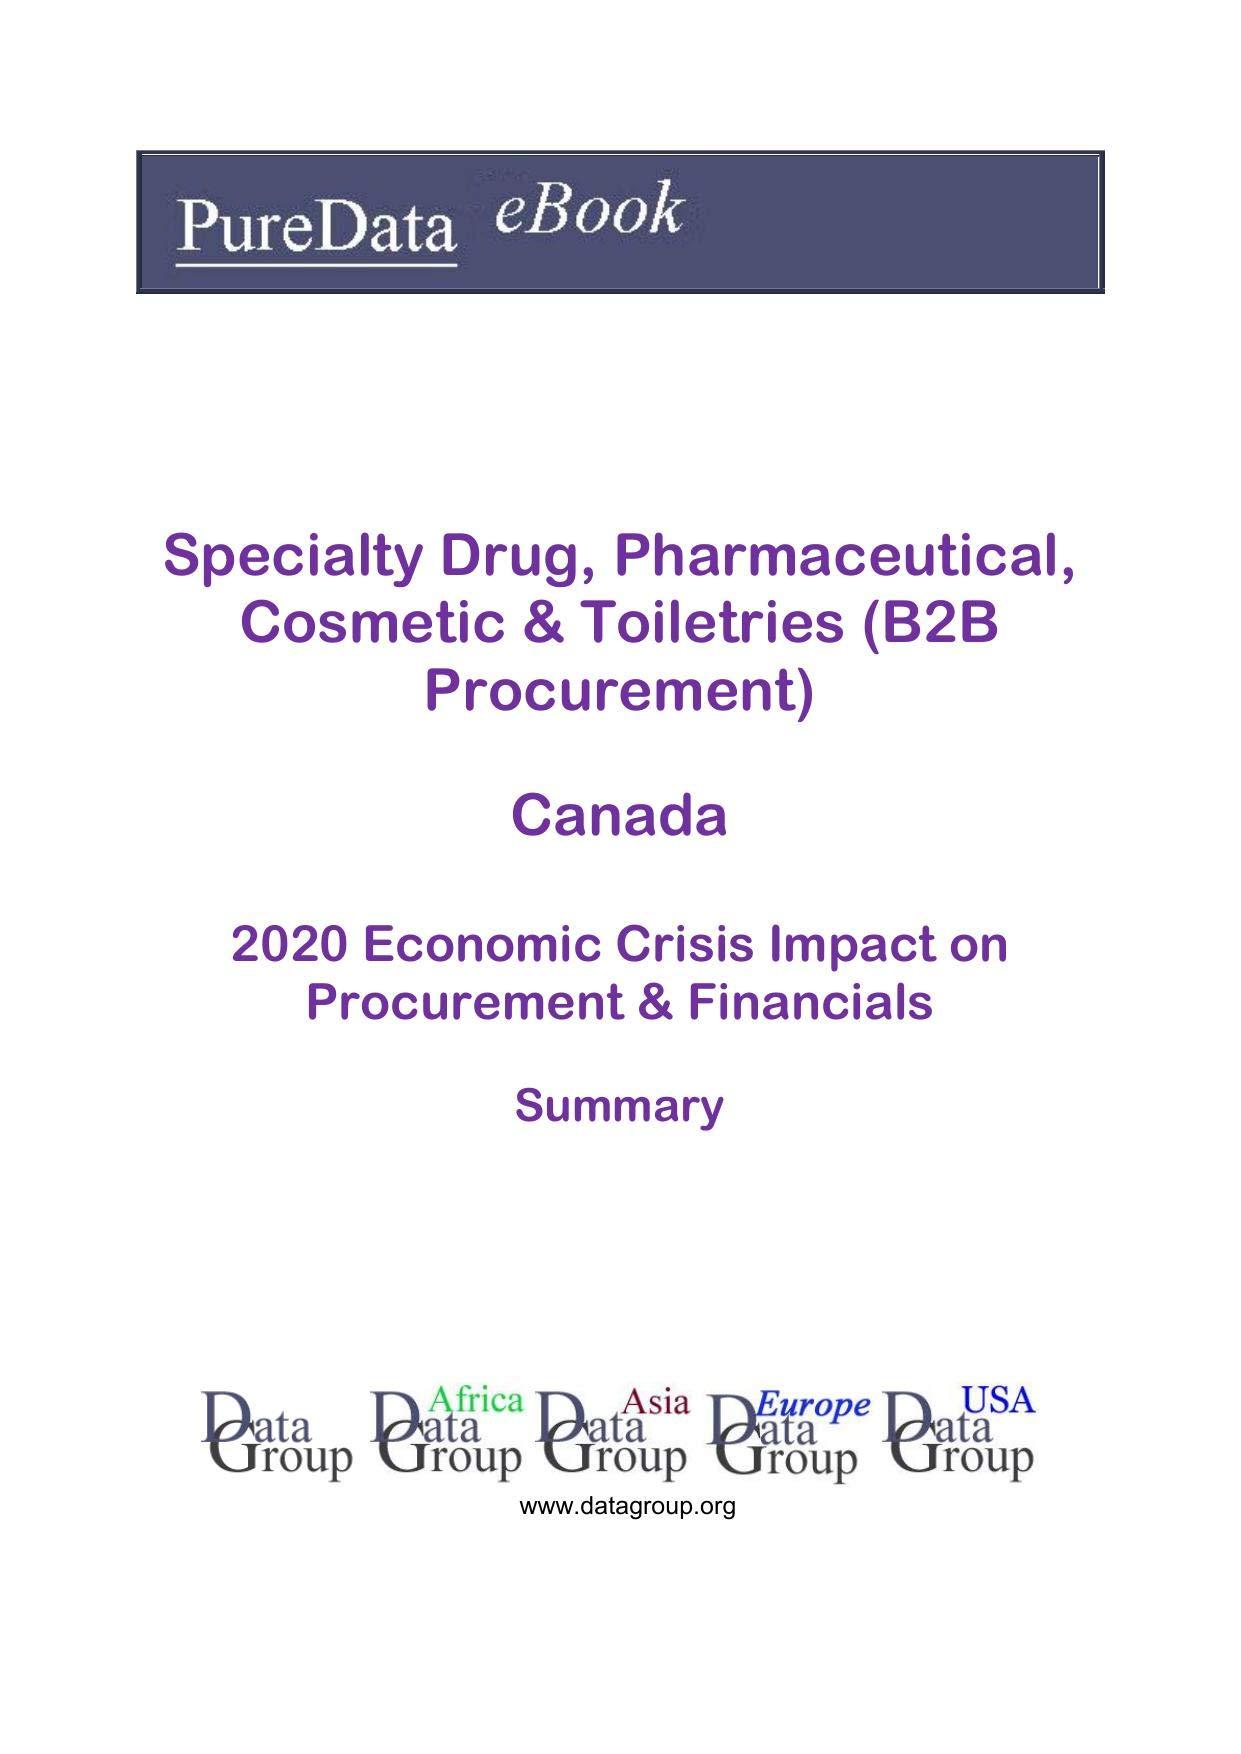 Specialty Drug, Pharmaceutical, Cosmetic & Toiletries (B2B Procurement) Canada Summary: 2020 Economic Crisis Impact on Revenues & Financials